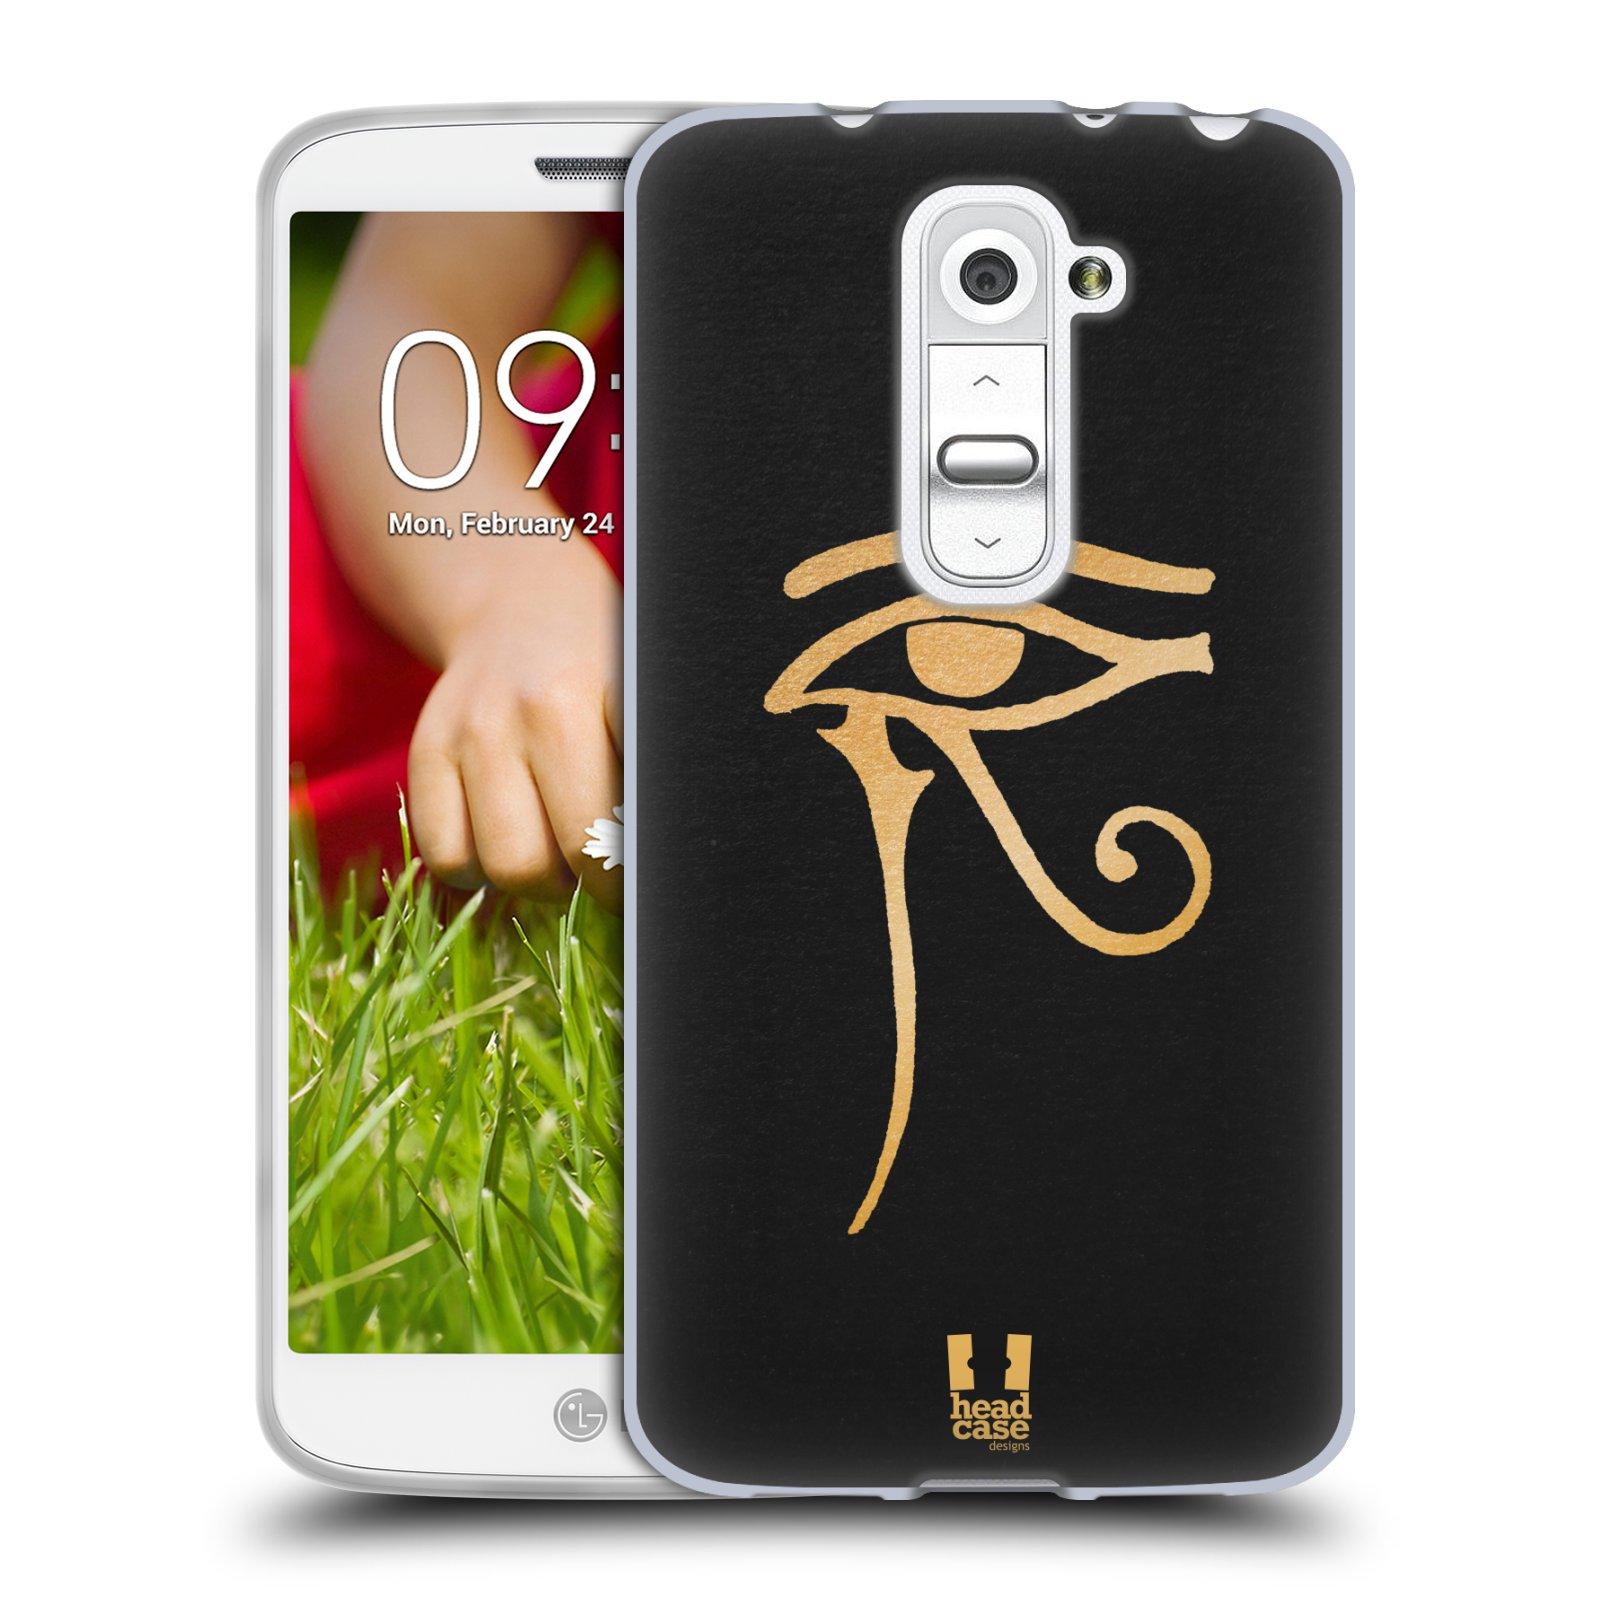 Silikonové pouzdro na mobil LG G2 Mini HEAD CASE EGYPT OKO BOHA RA (Silikonový kryt či obal na mobilní telefon LG G2 Mini D620)